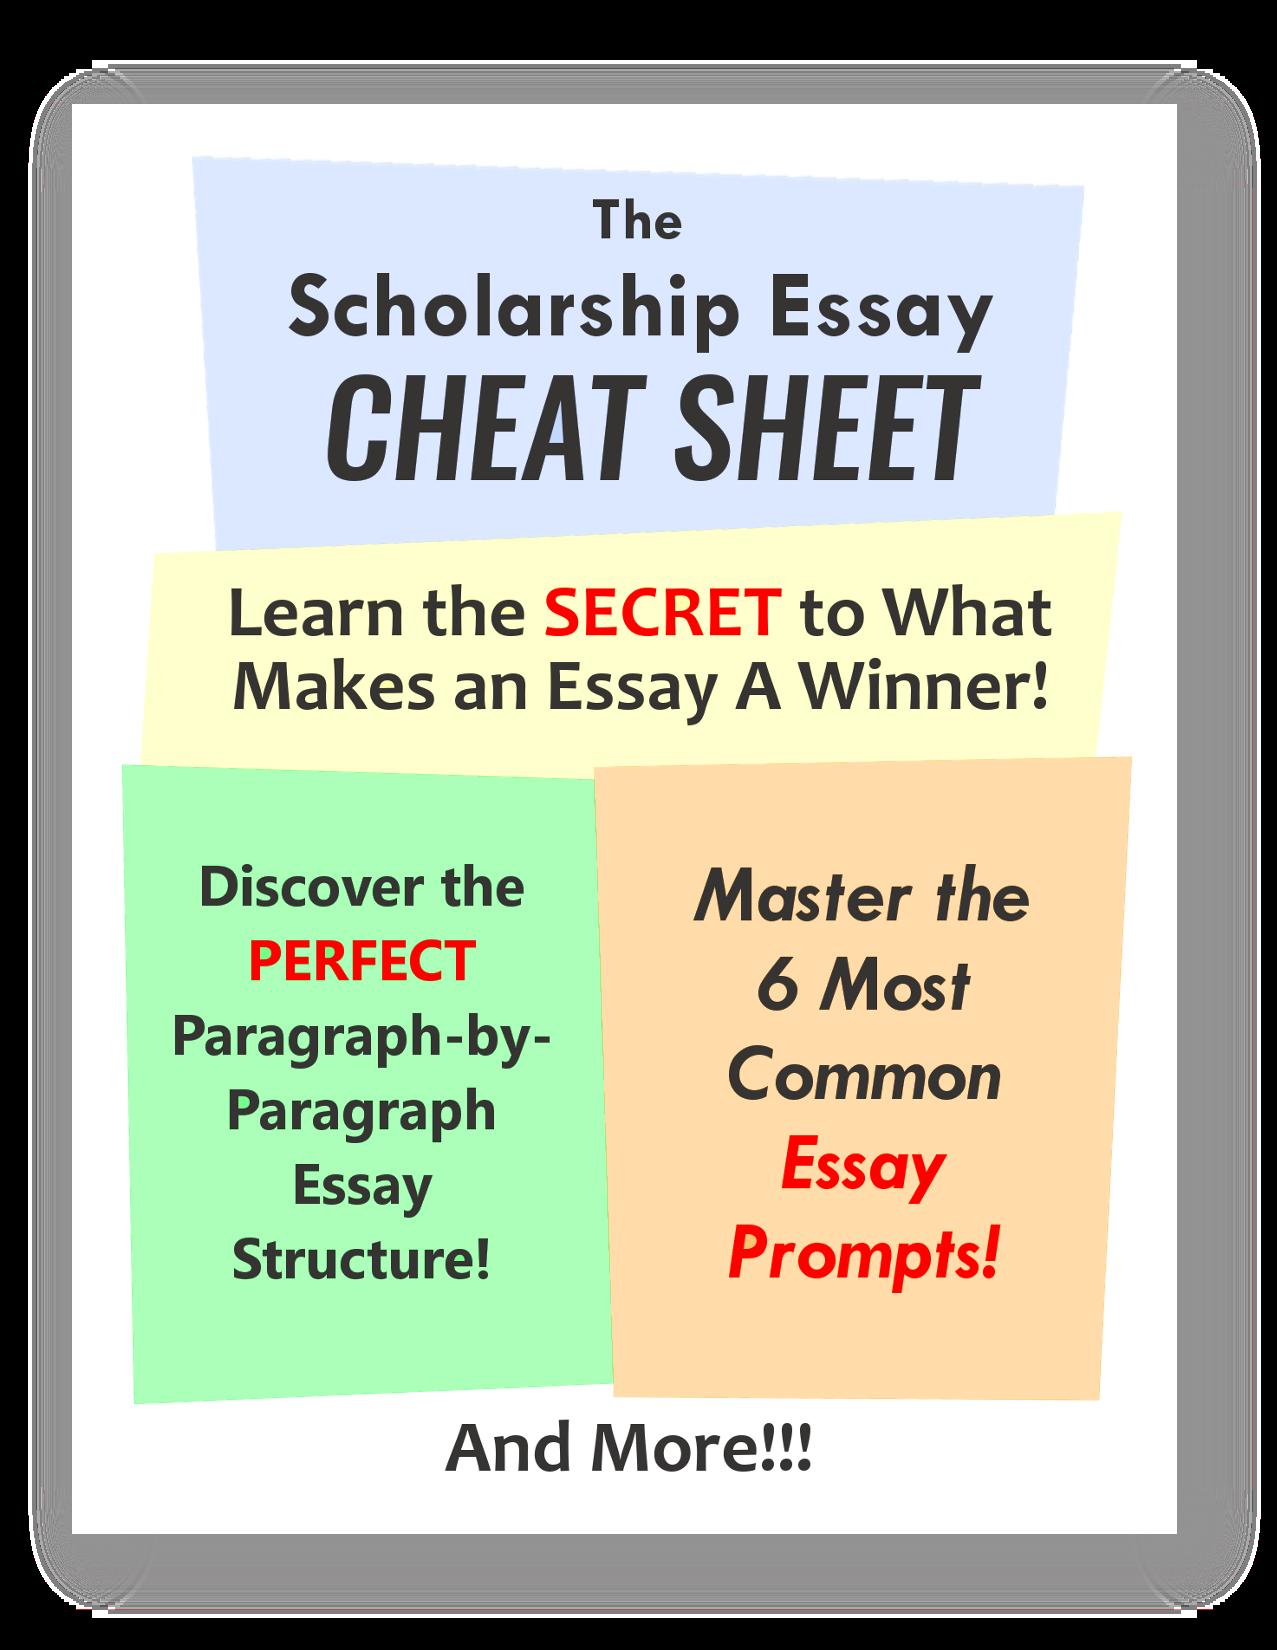 013 Scholarship Essay Prompts Example Magnificent Robertson 2018-19 Vanderbilt Washington And Lee Johnson Full